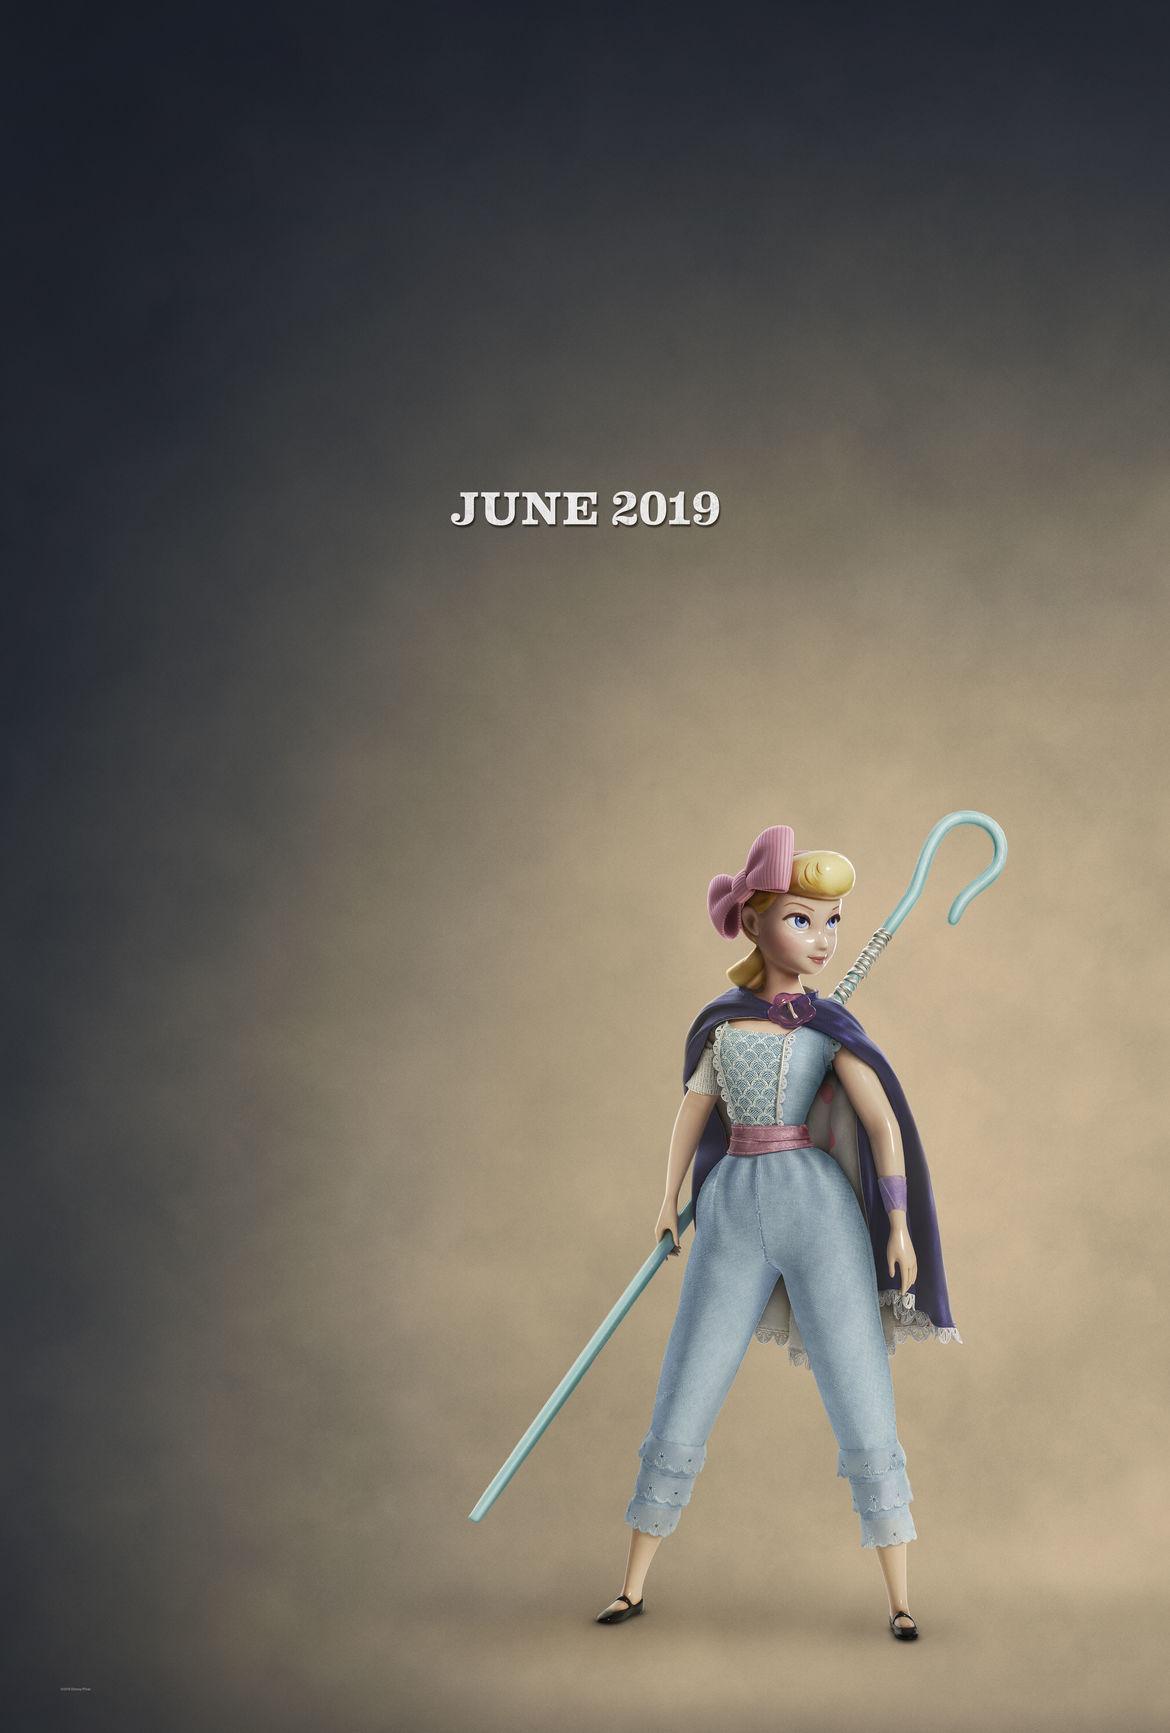 Bo Peep Toy Story 4